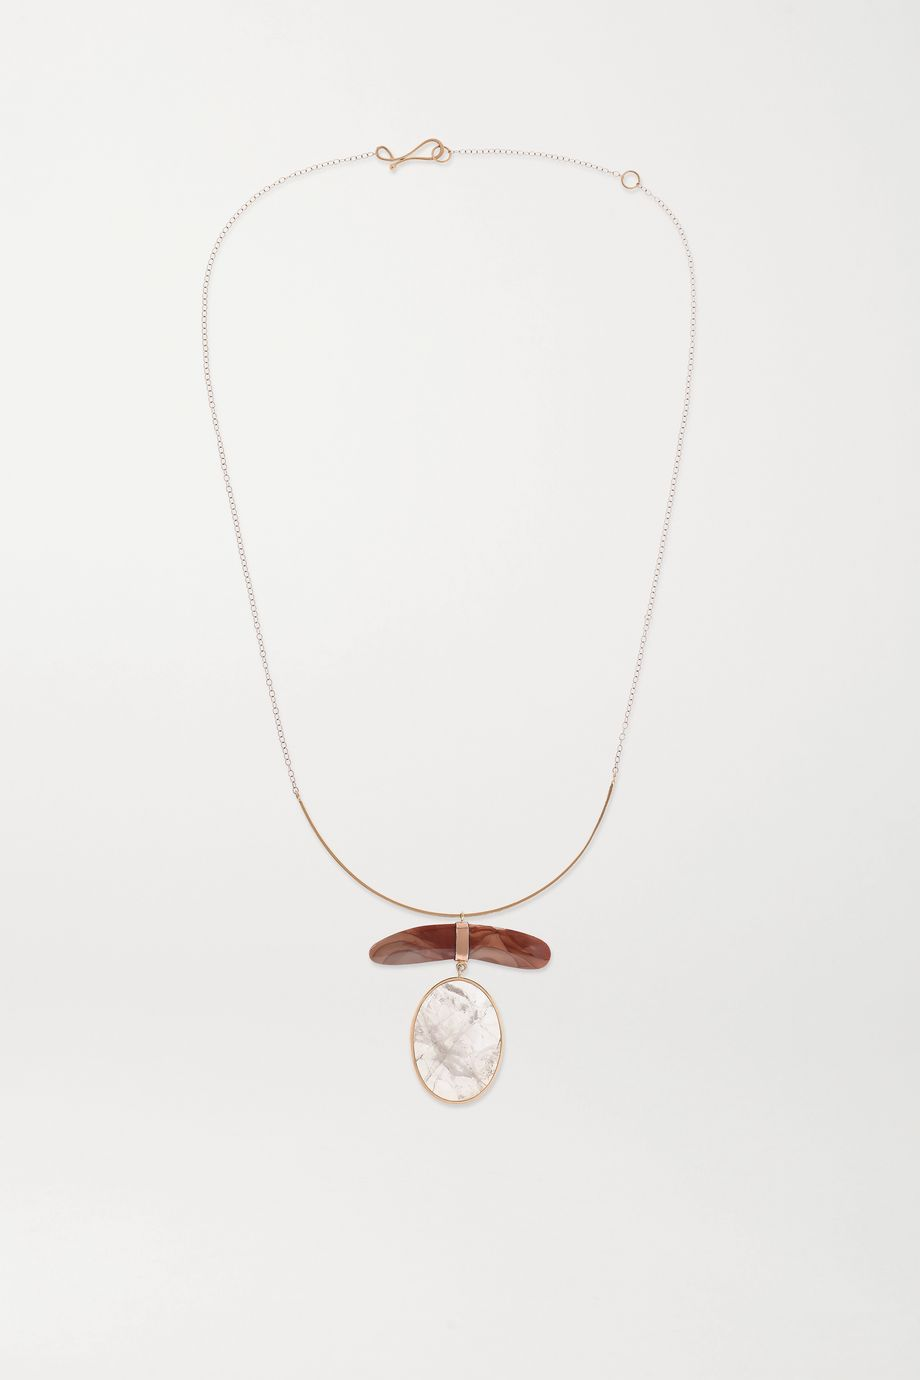 Melissa Joy Manning + NET SUSTAIN 14-karat gold, rose quartz and jasper necklace